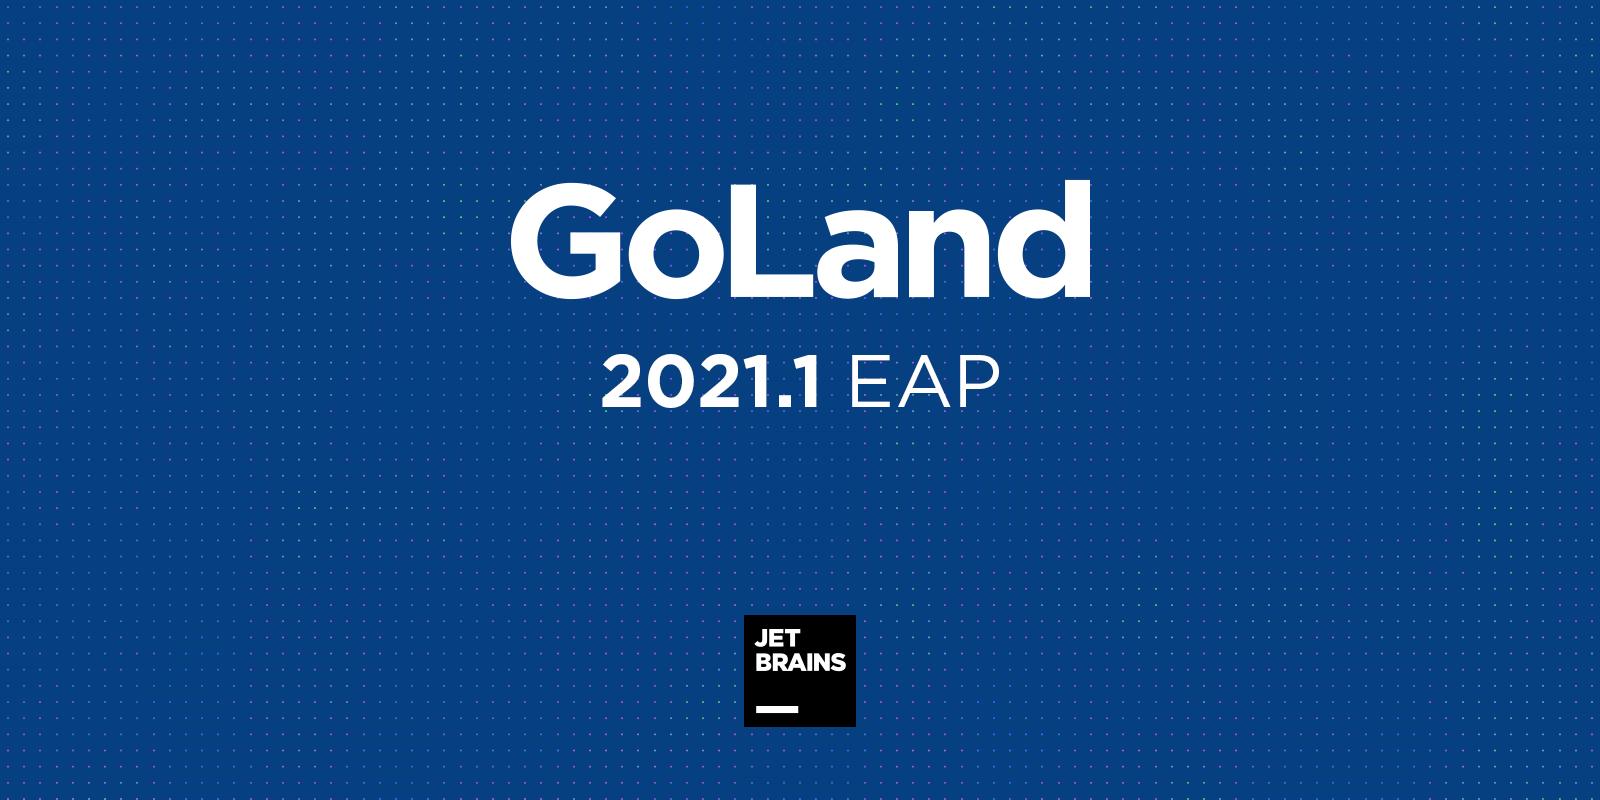 GoLand 2021.1 Early Access Program Begins!